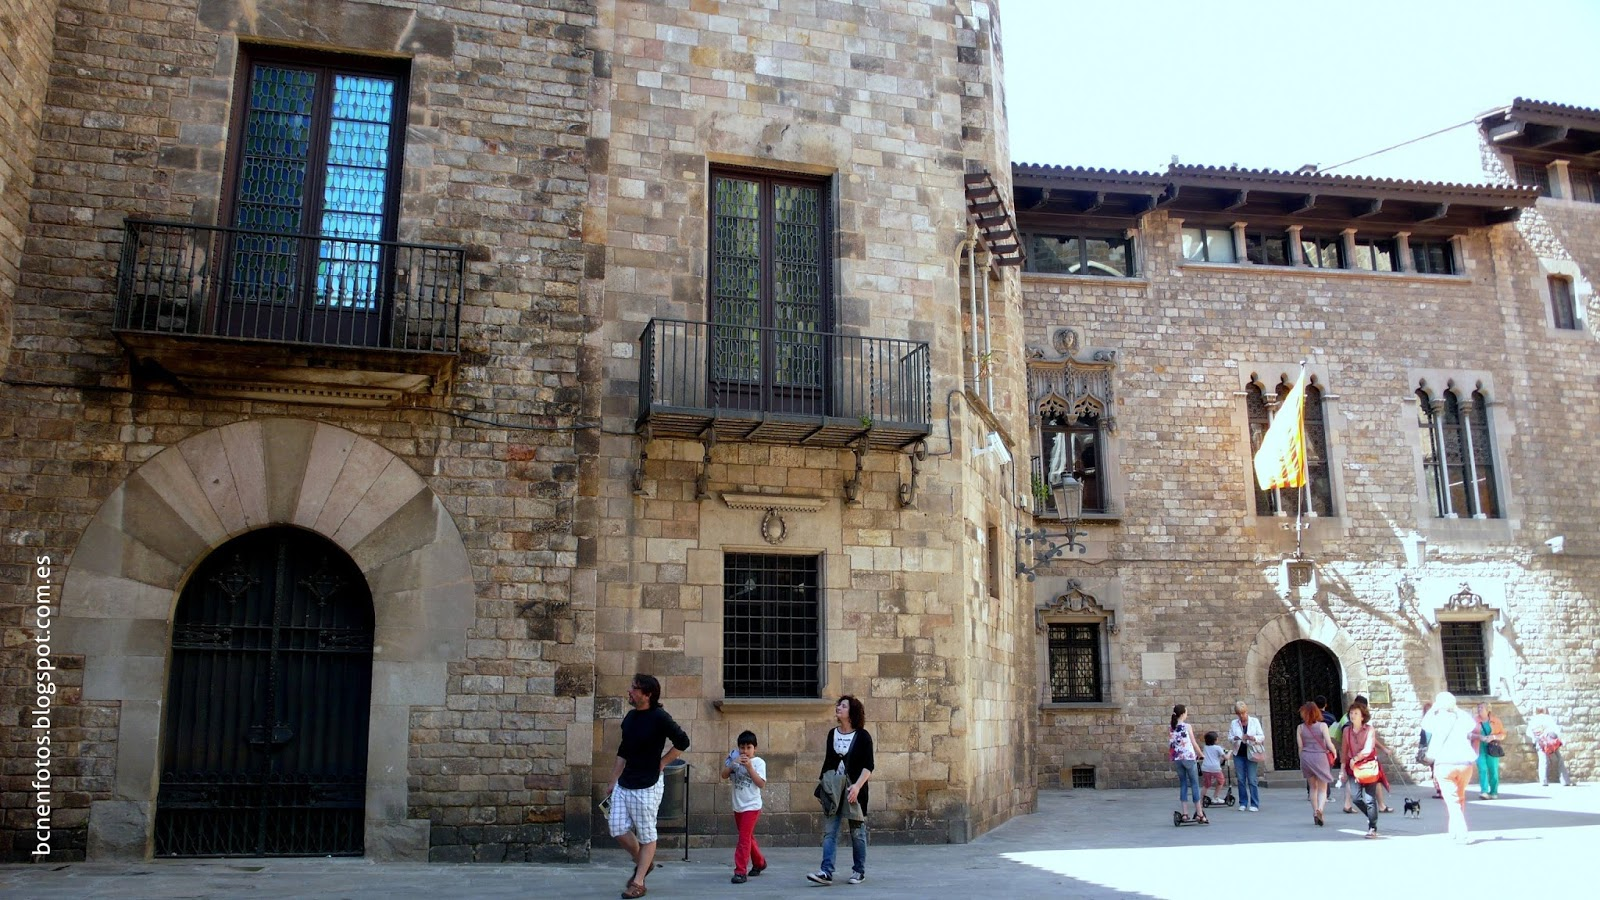 Mi barcelona barrio g tico alrededores de la catedral iv for Inmobiliarias barcelona